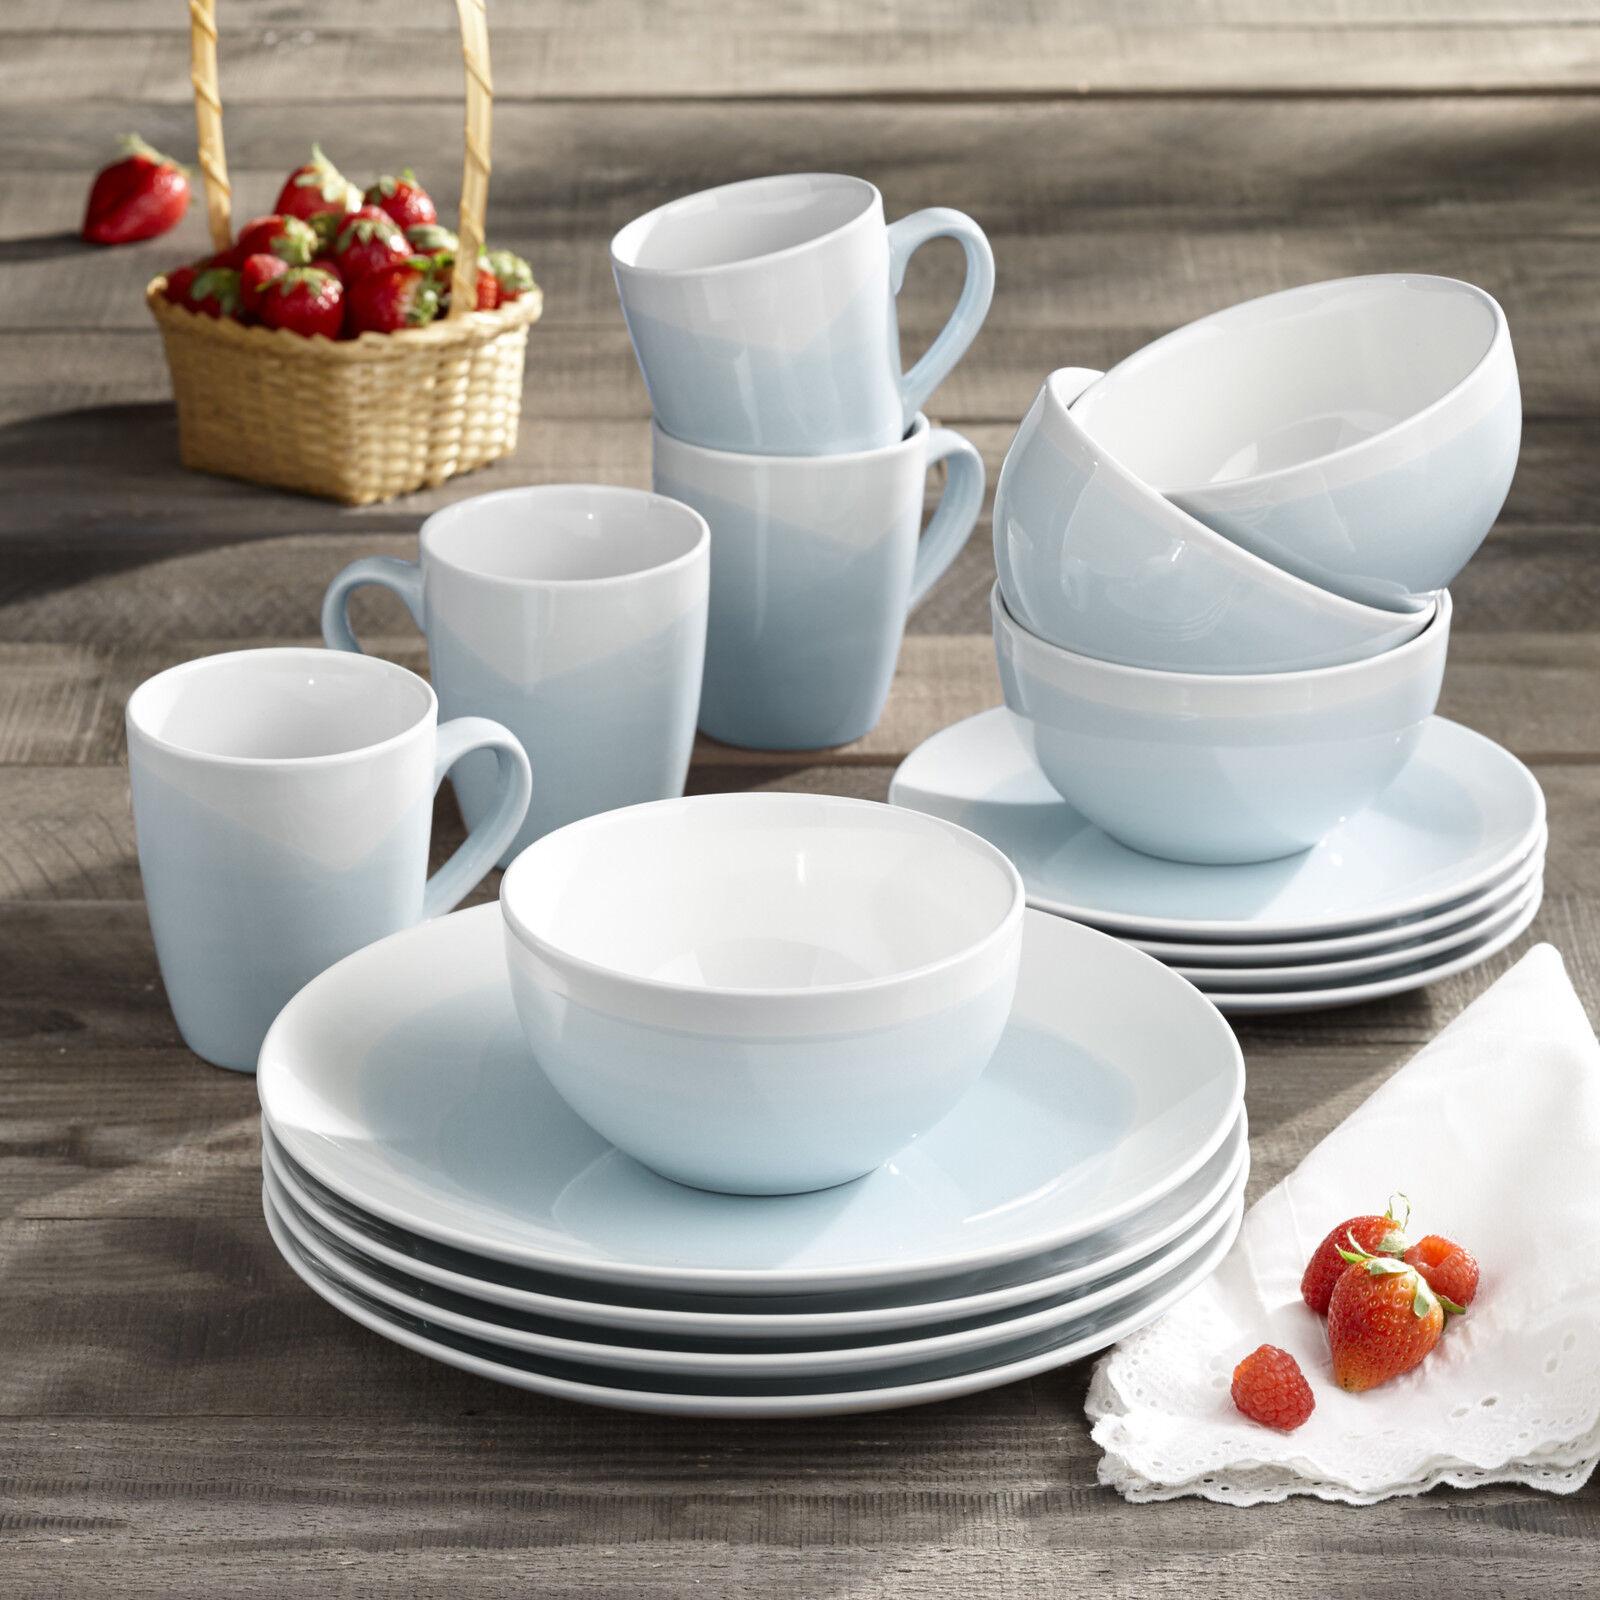 Bleu Brushstroke Dinnerware Set 16 Piece DESSERT 4 Place Vaisselle Bols Tasses Assiettes